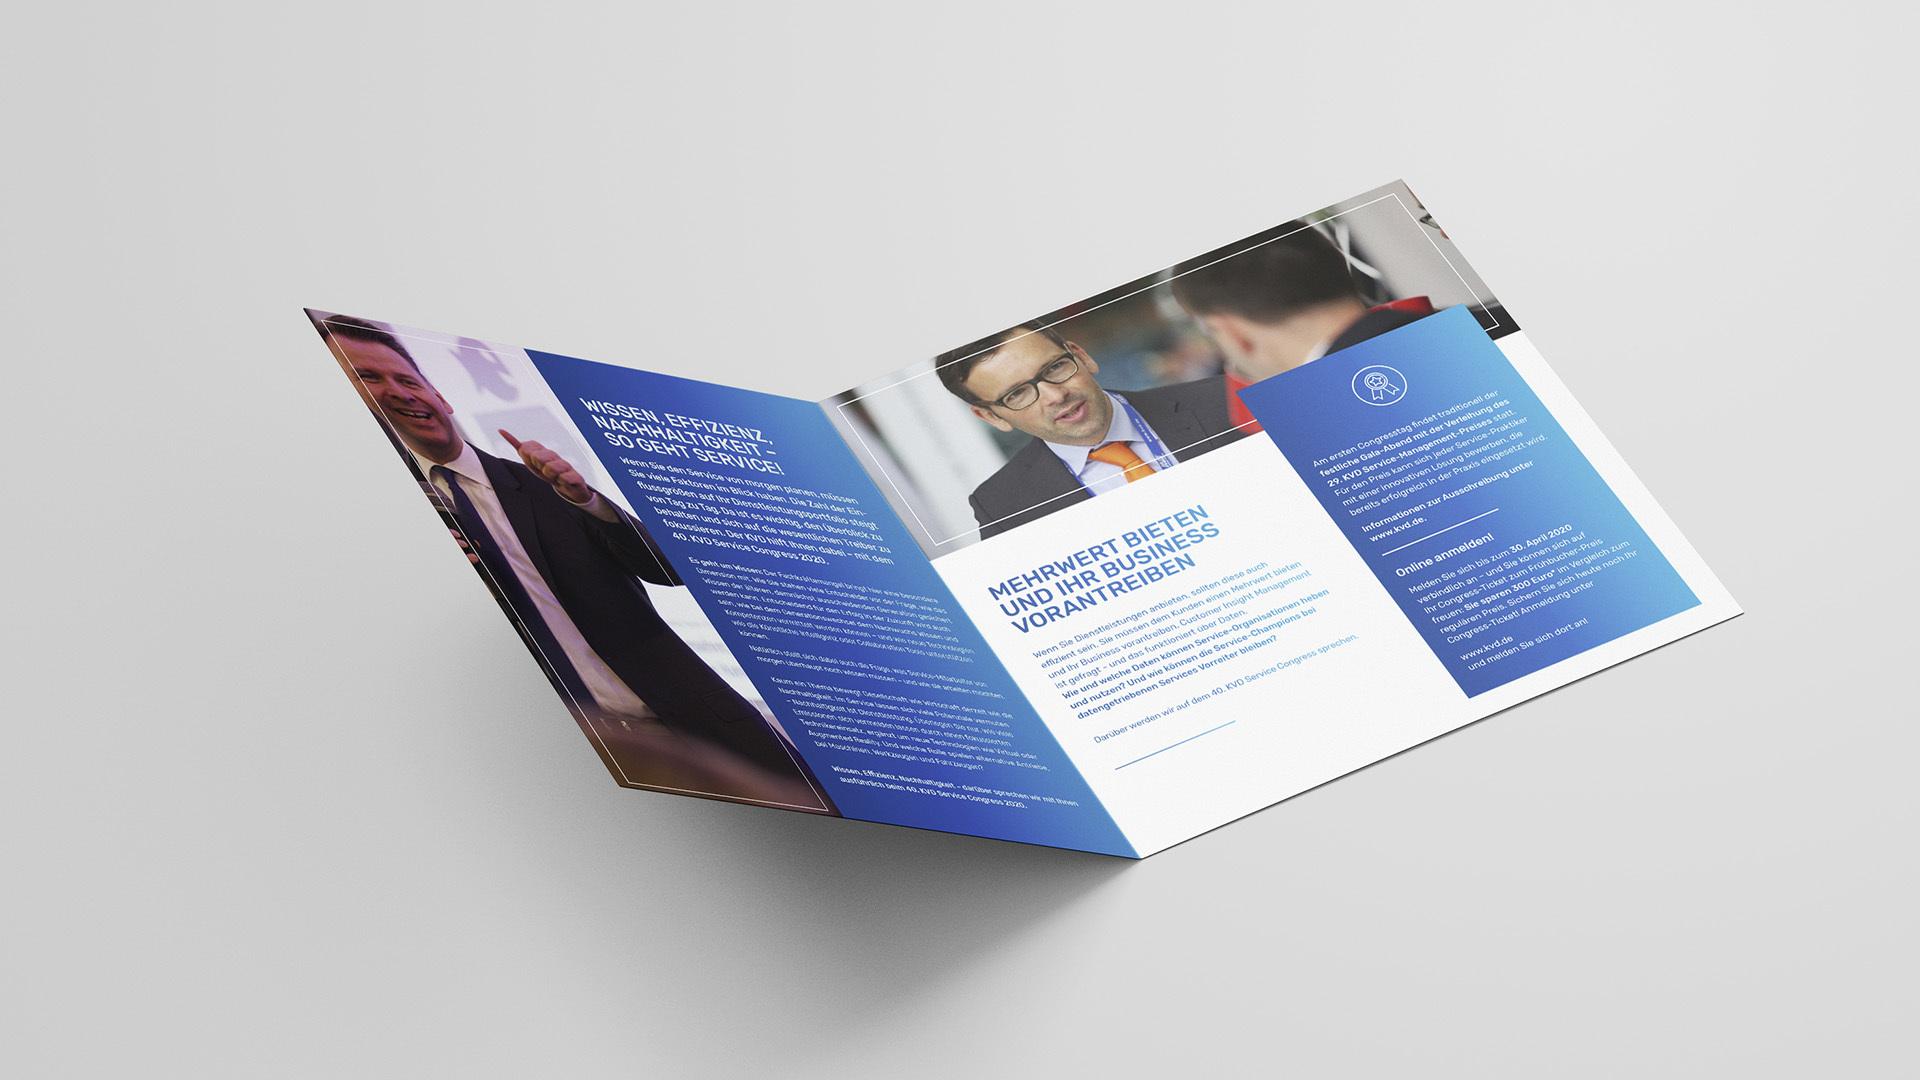 KVD Congress-Broschüre